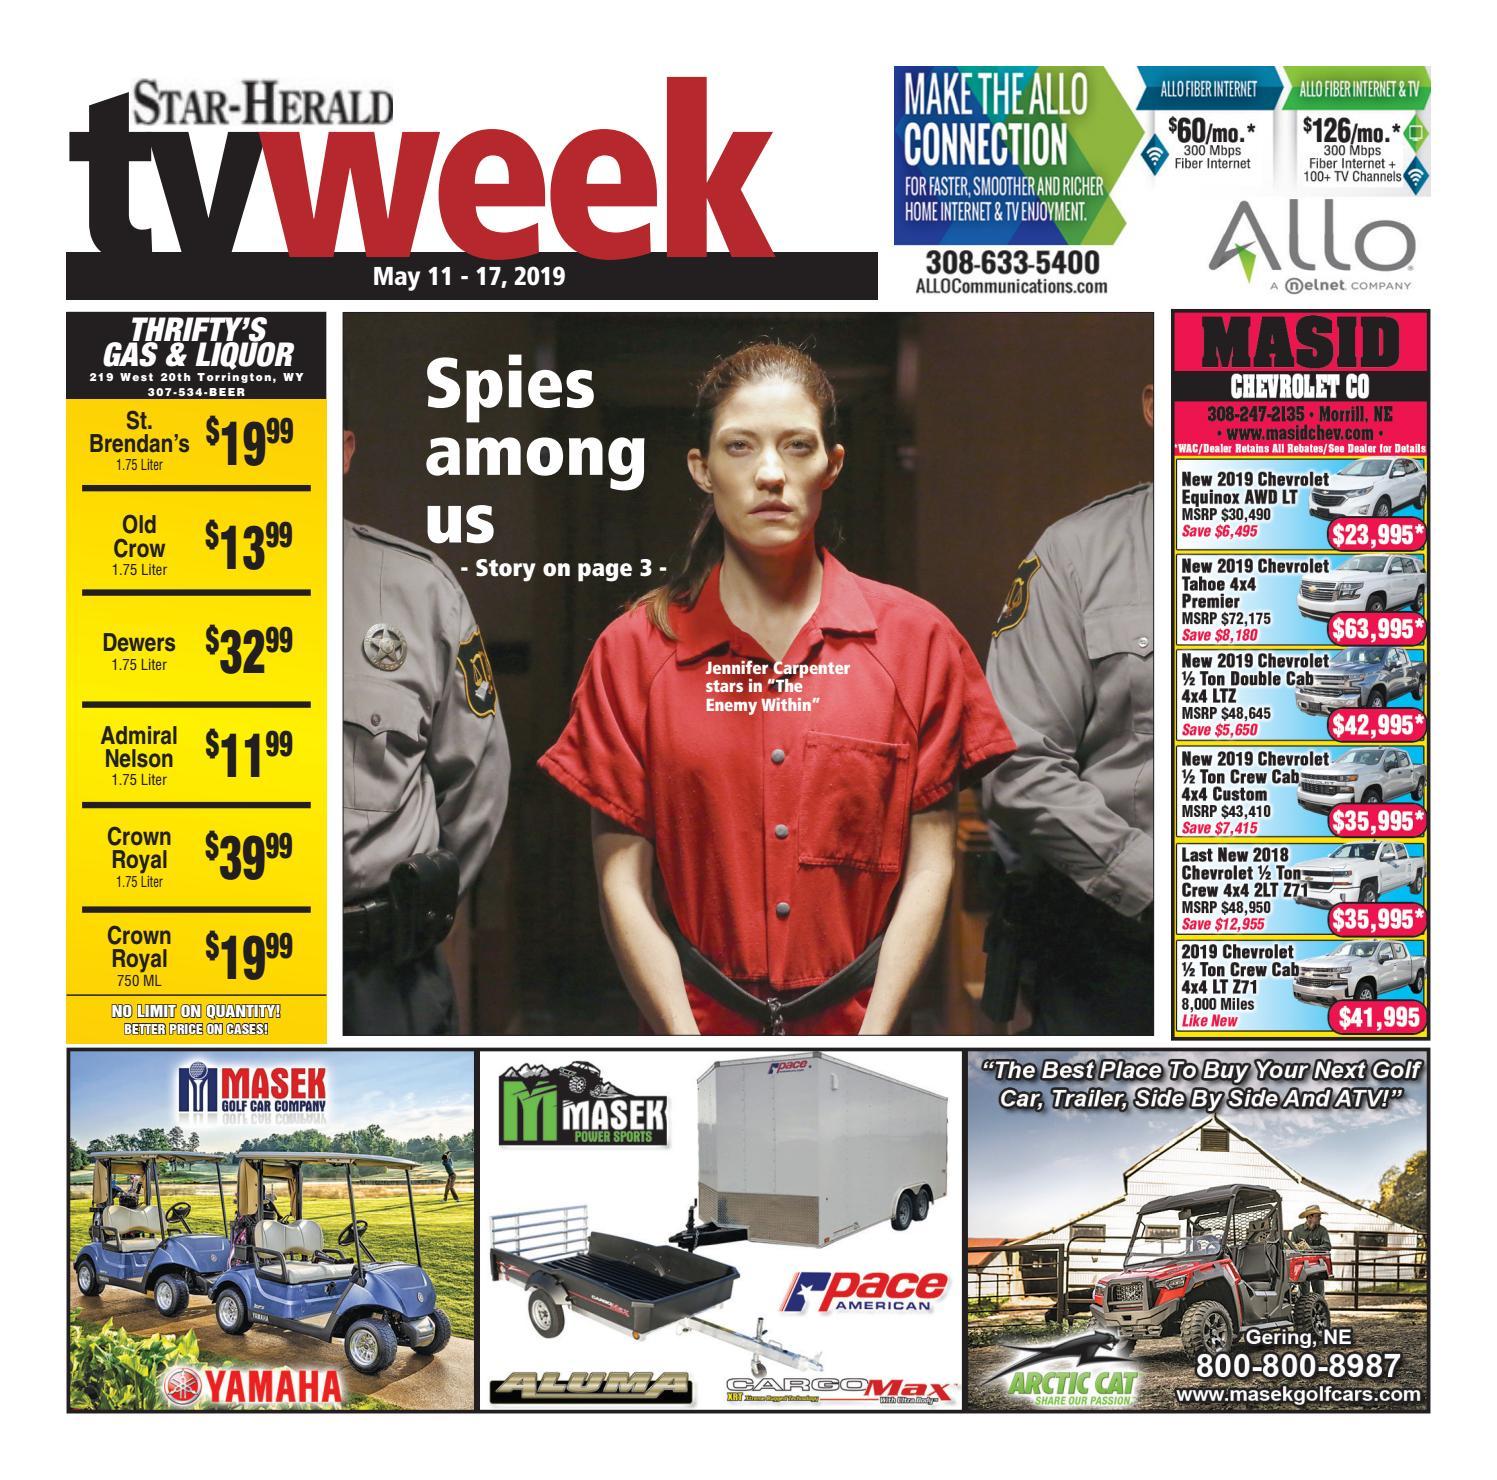 TV Week May 11, 2019 by Star-Herald - issuu